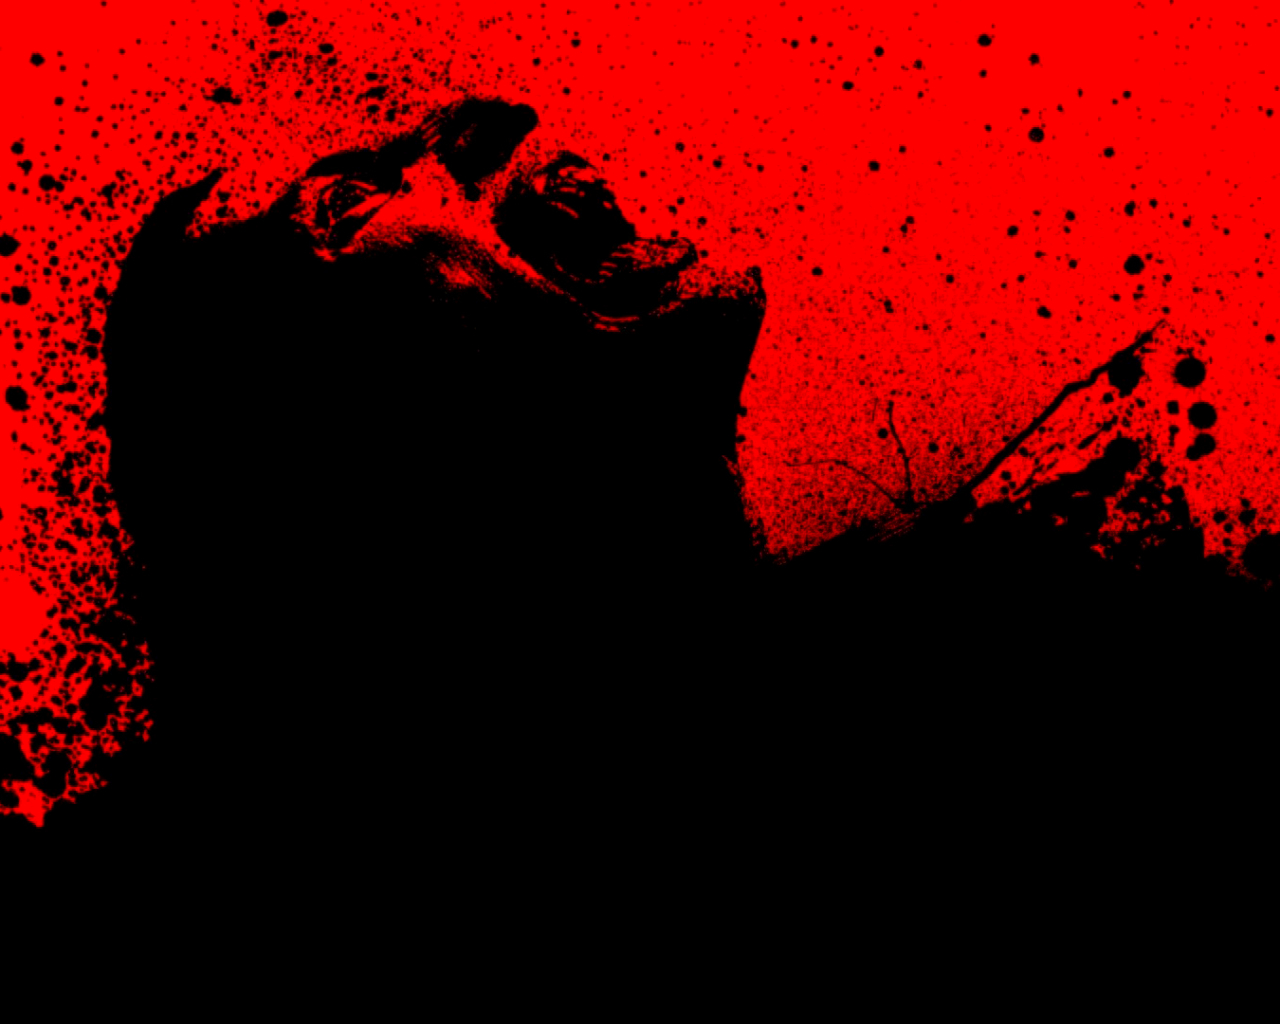 30 Days Of Night Horror Movies Wallpaper 41259352 Fanpop